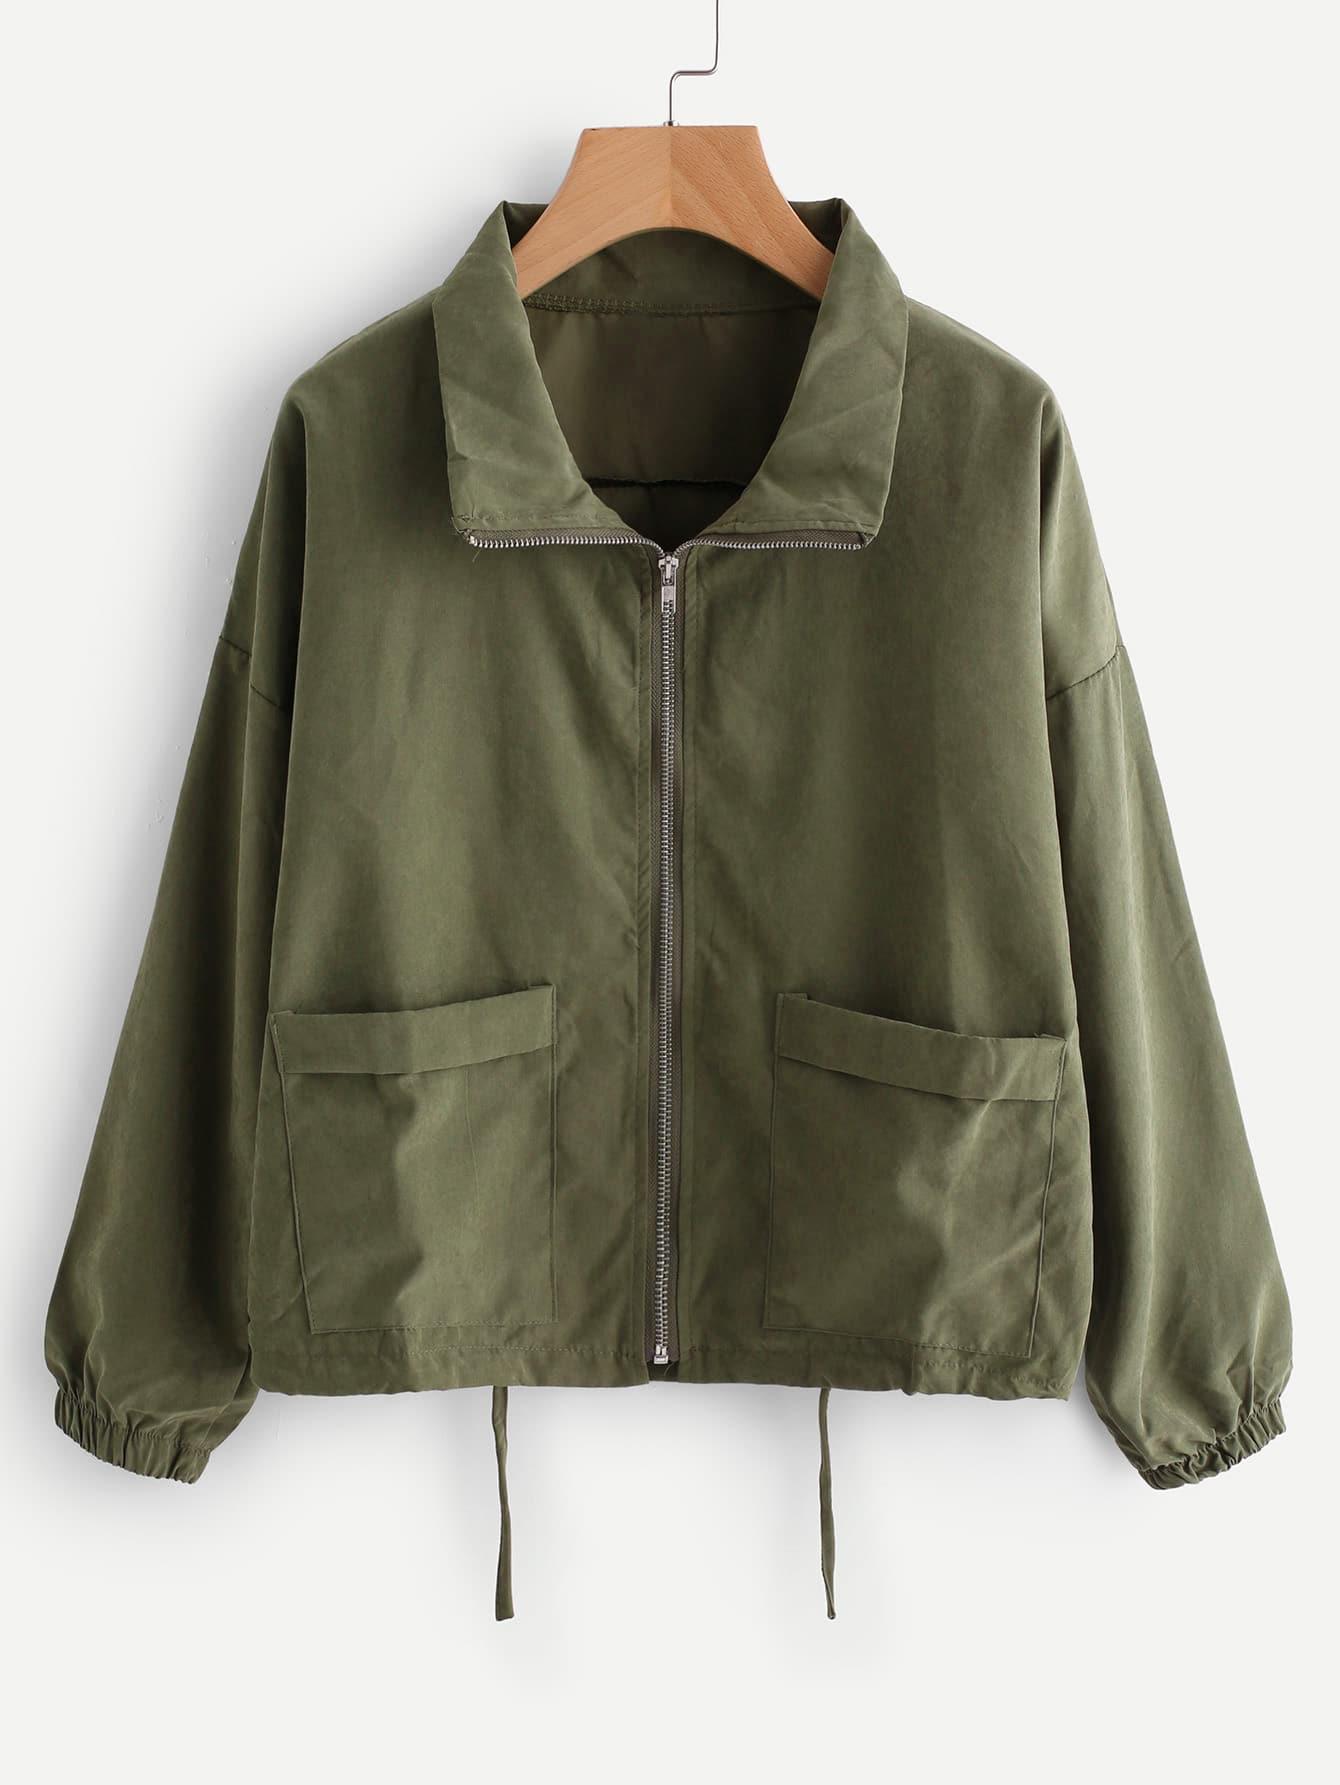 Zip Up Drawstring Jacket Sheinsheinside Tendencies Sweater Hoody Green Zipper Olive S